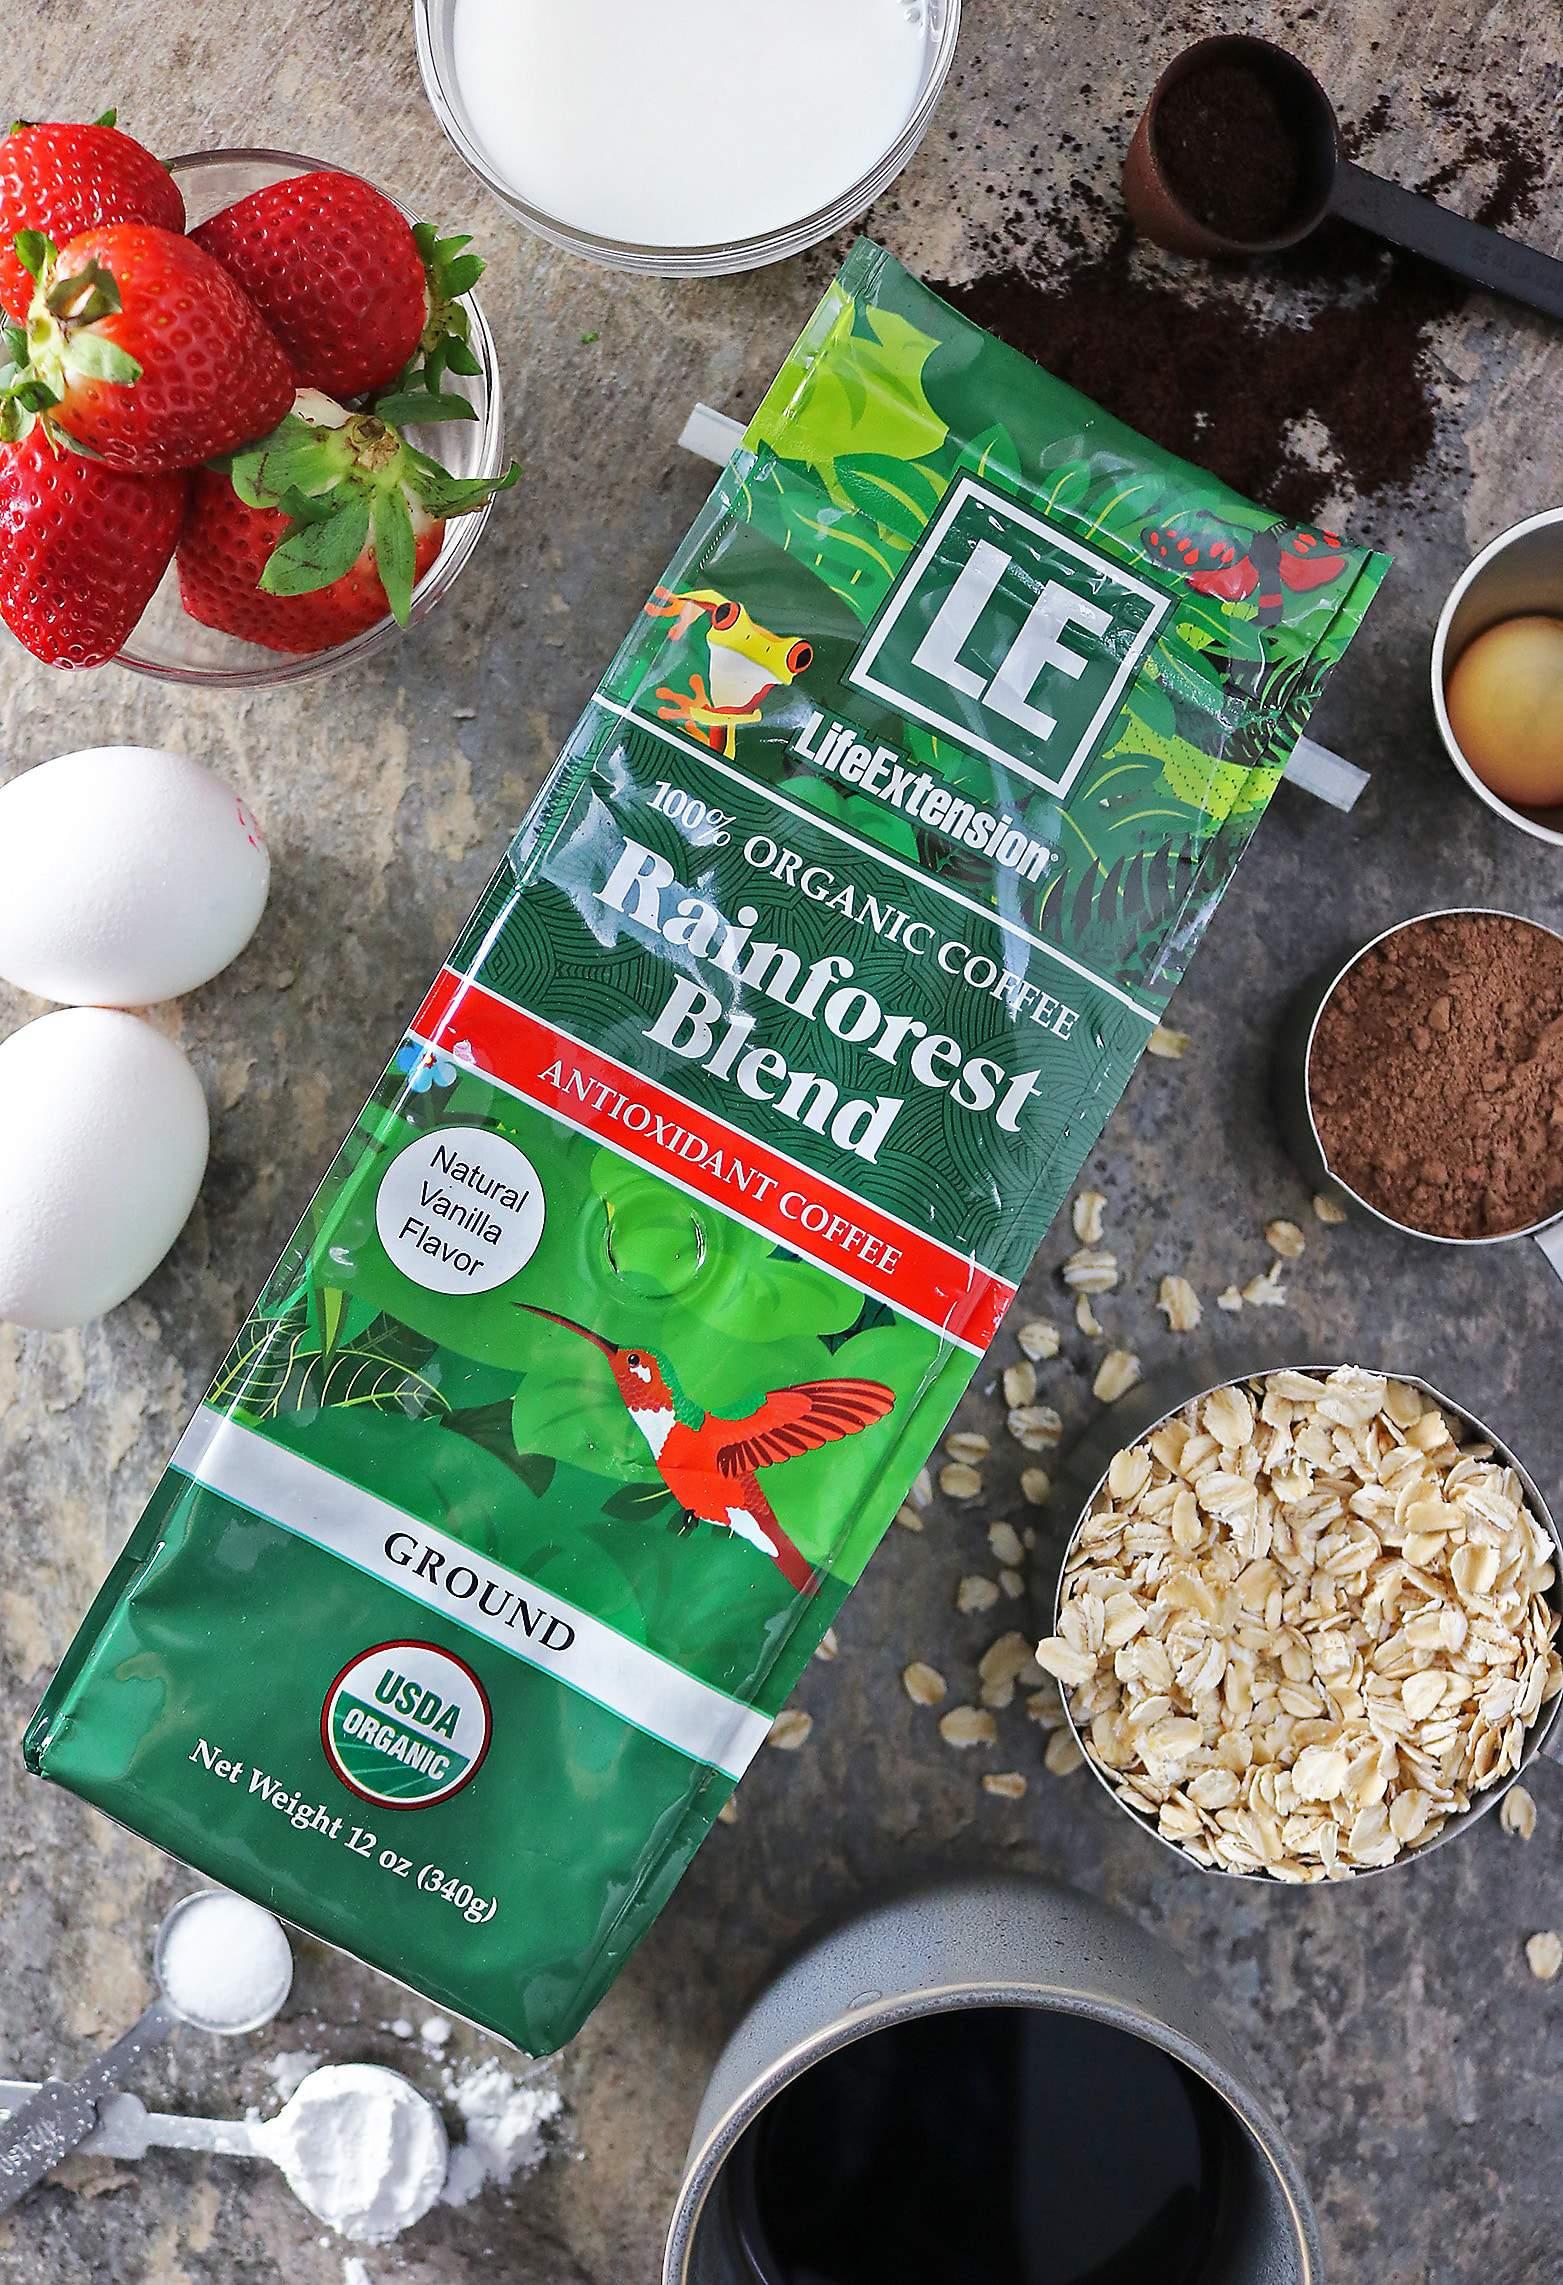 Life Extension Organic Antioxidant Rainforest Blend Coffee